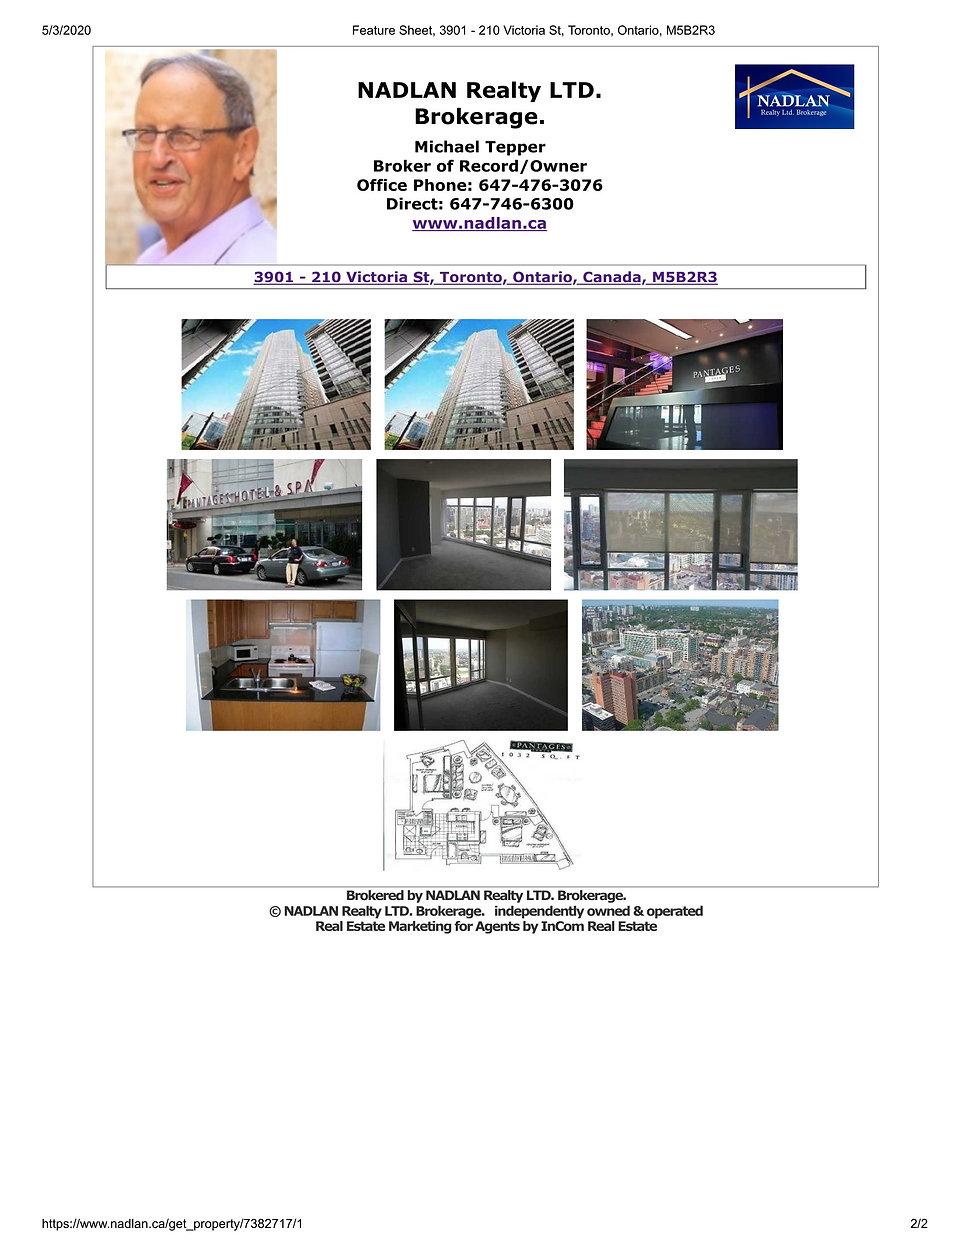 210 Victoria 3901 pg 2.jpg